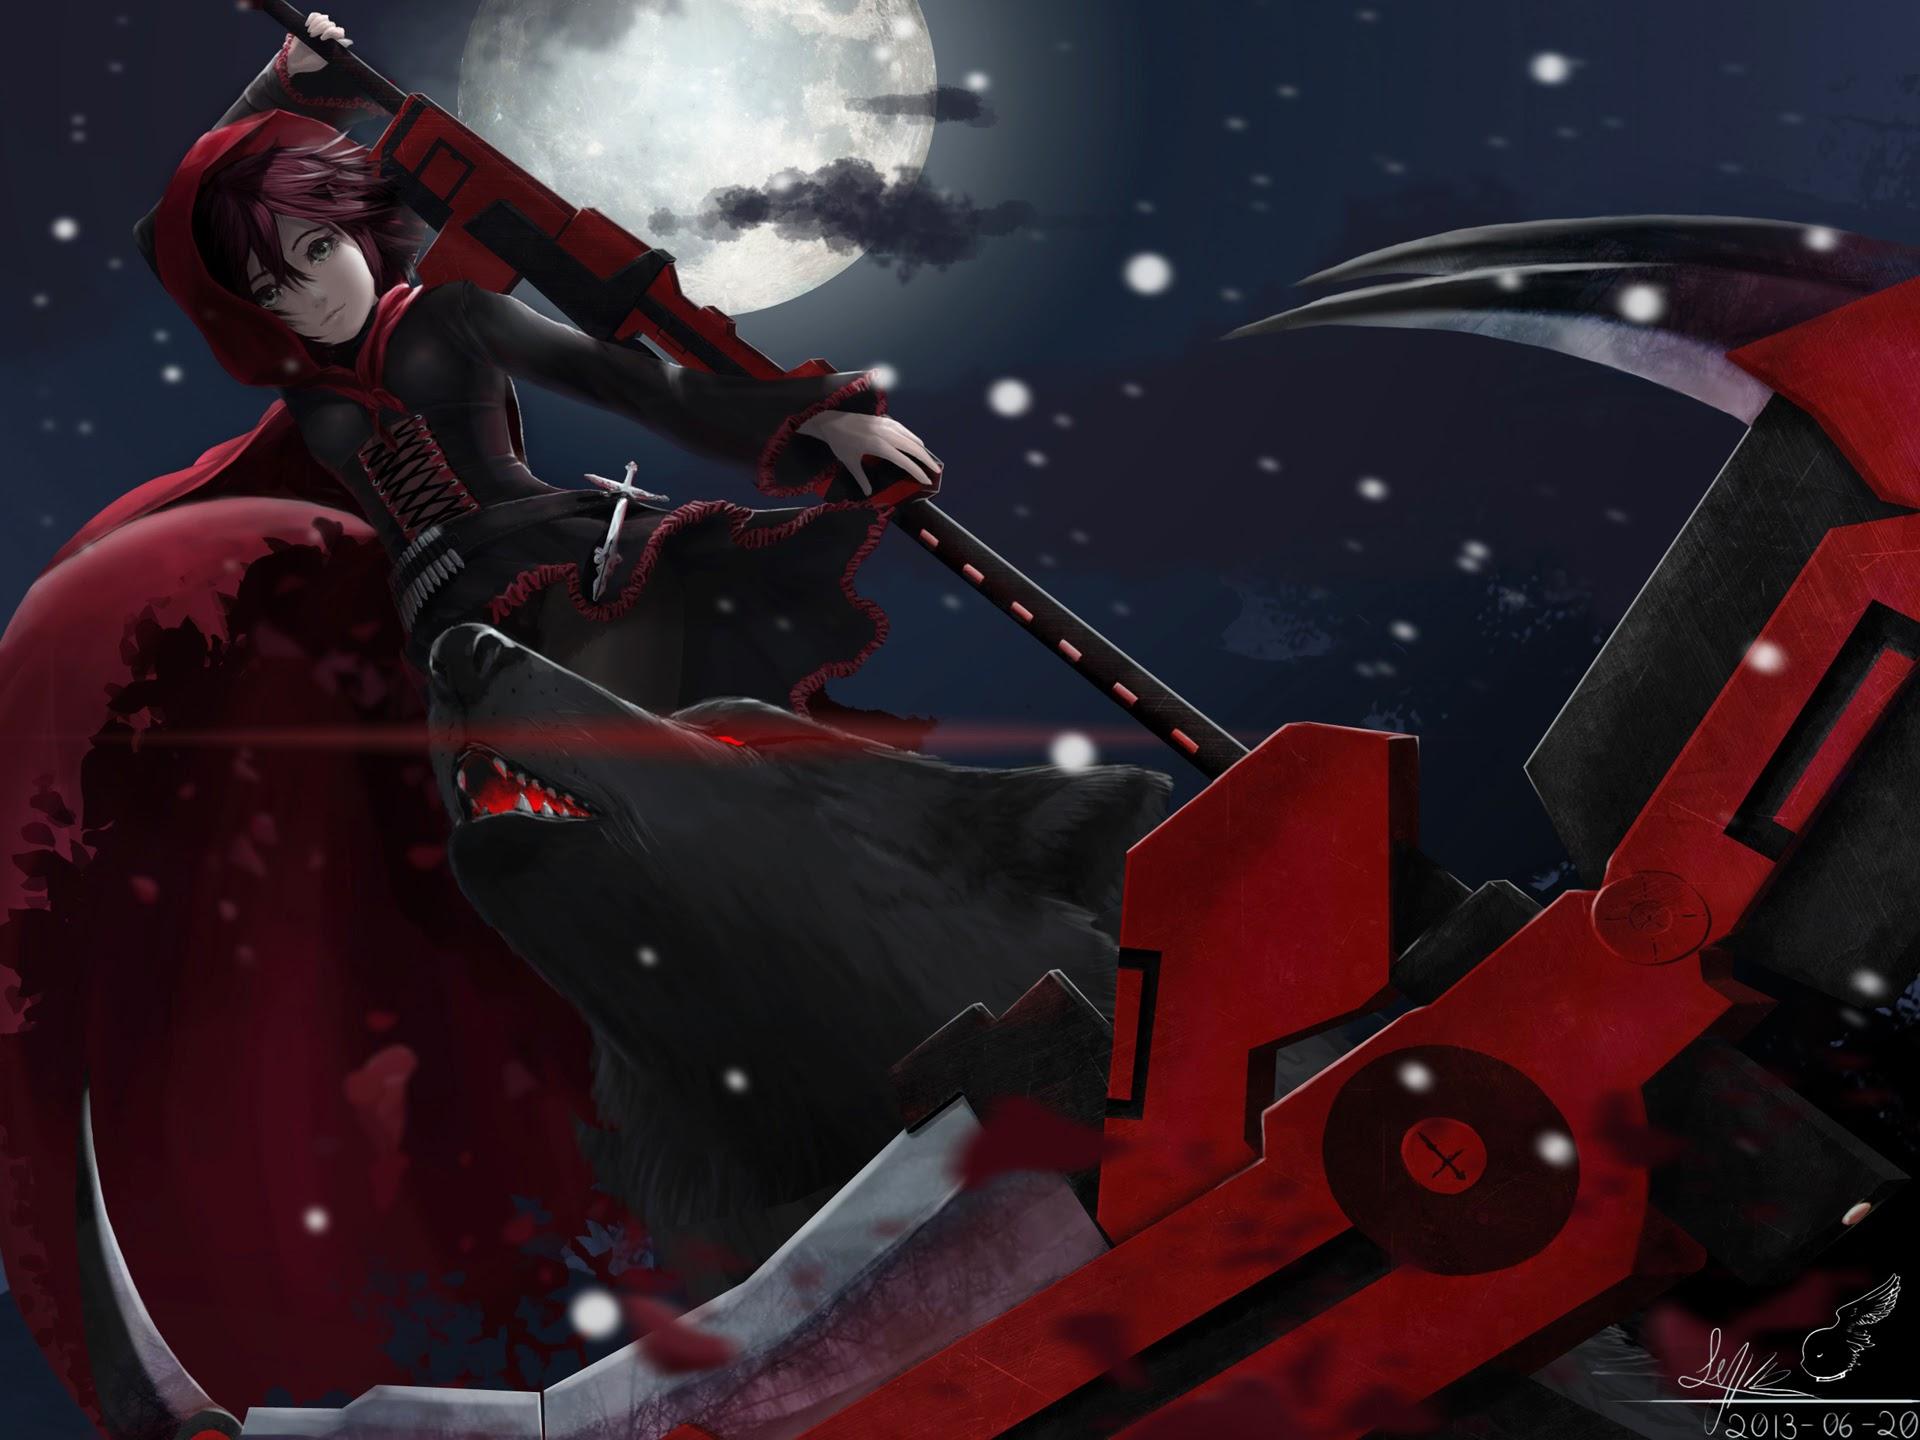 rwby anime scythe wallpaper - photo #25